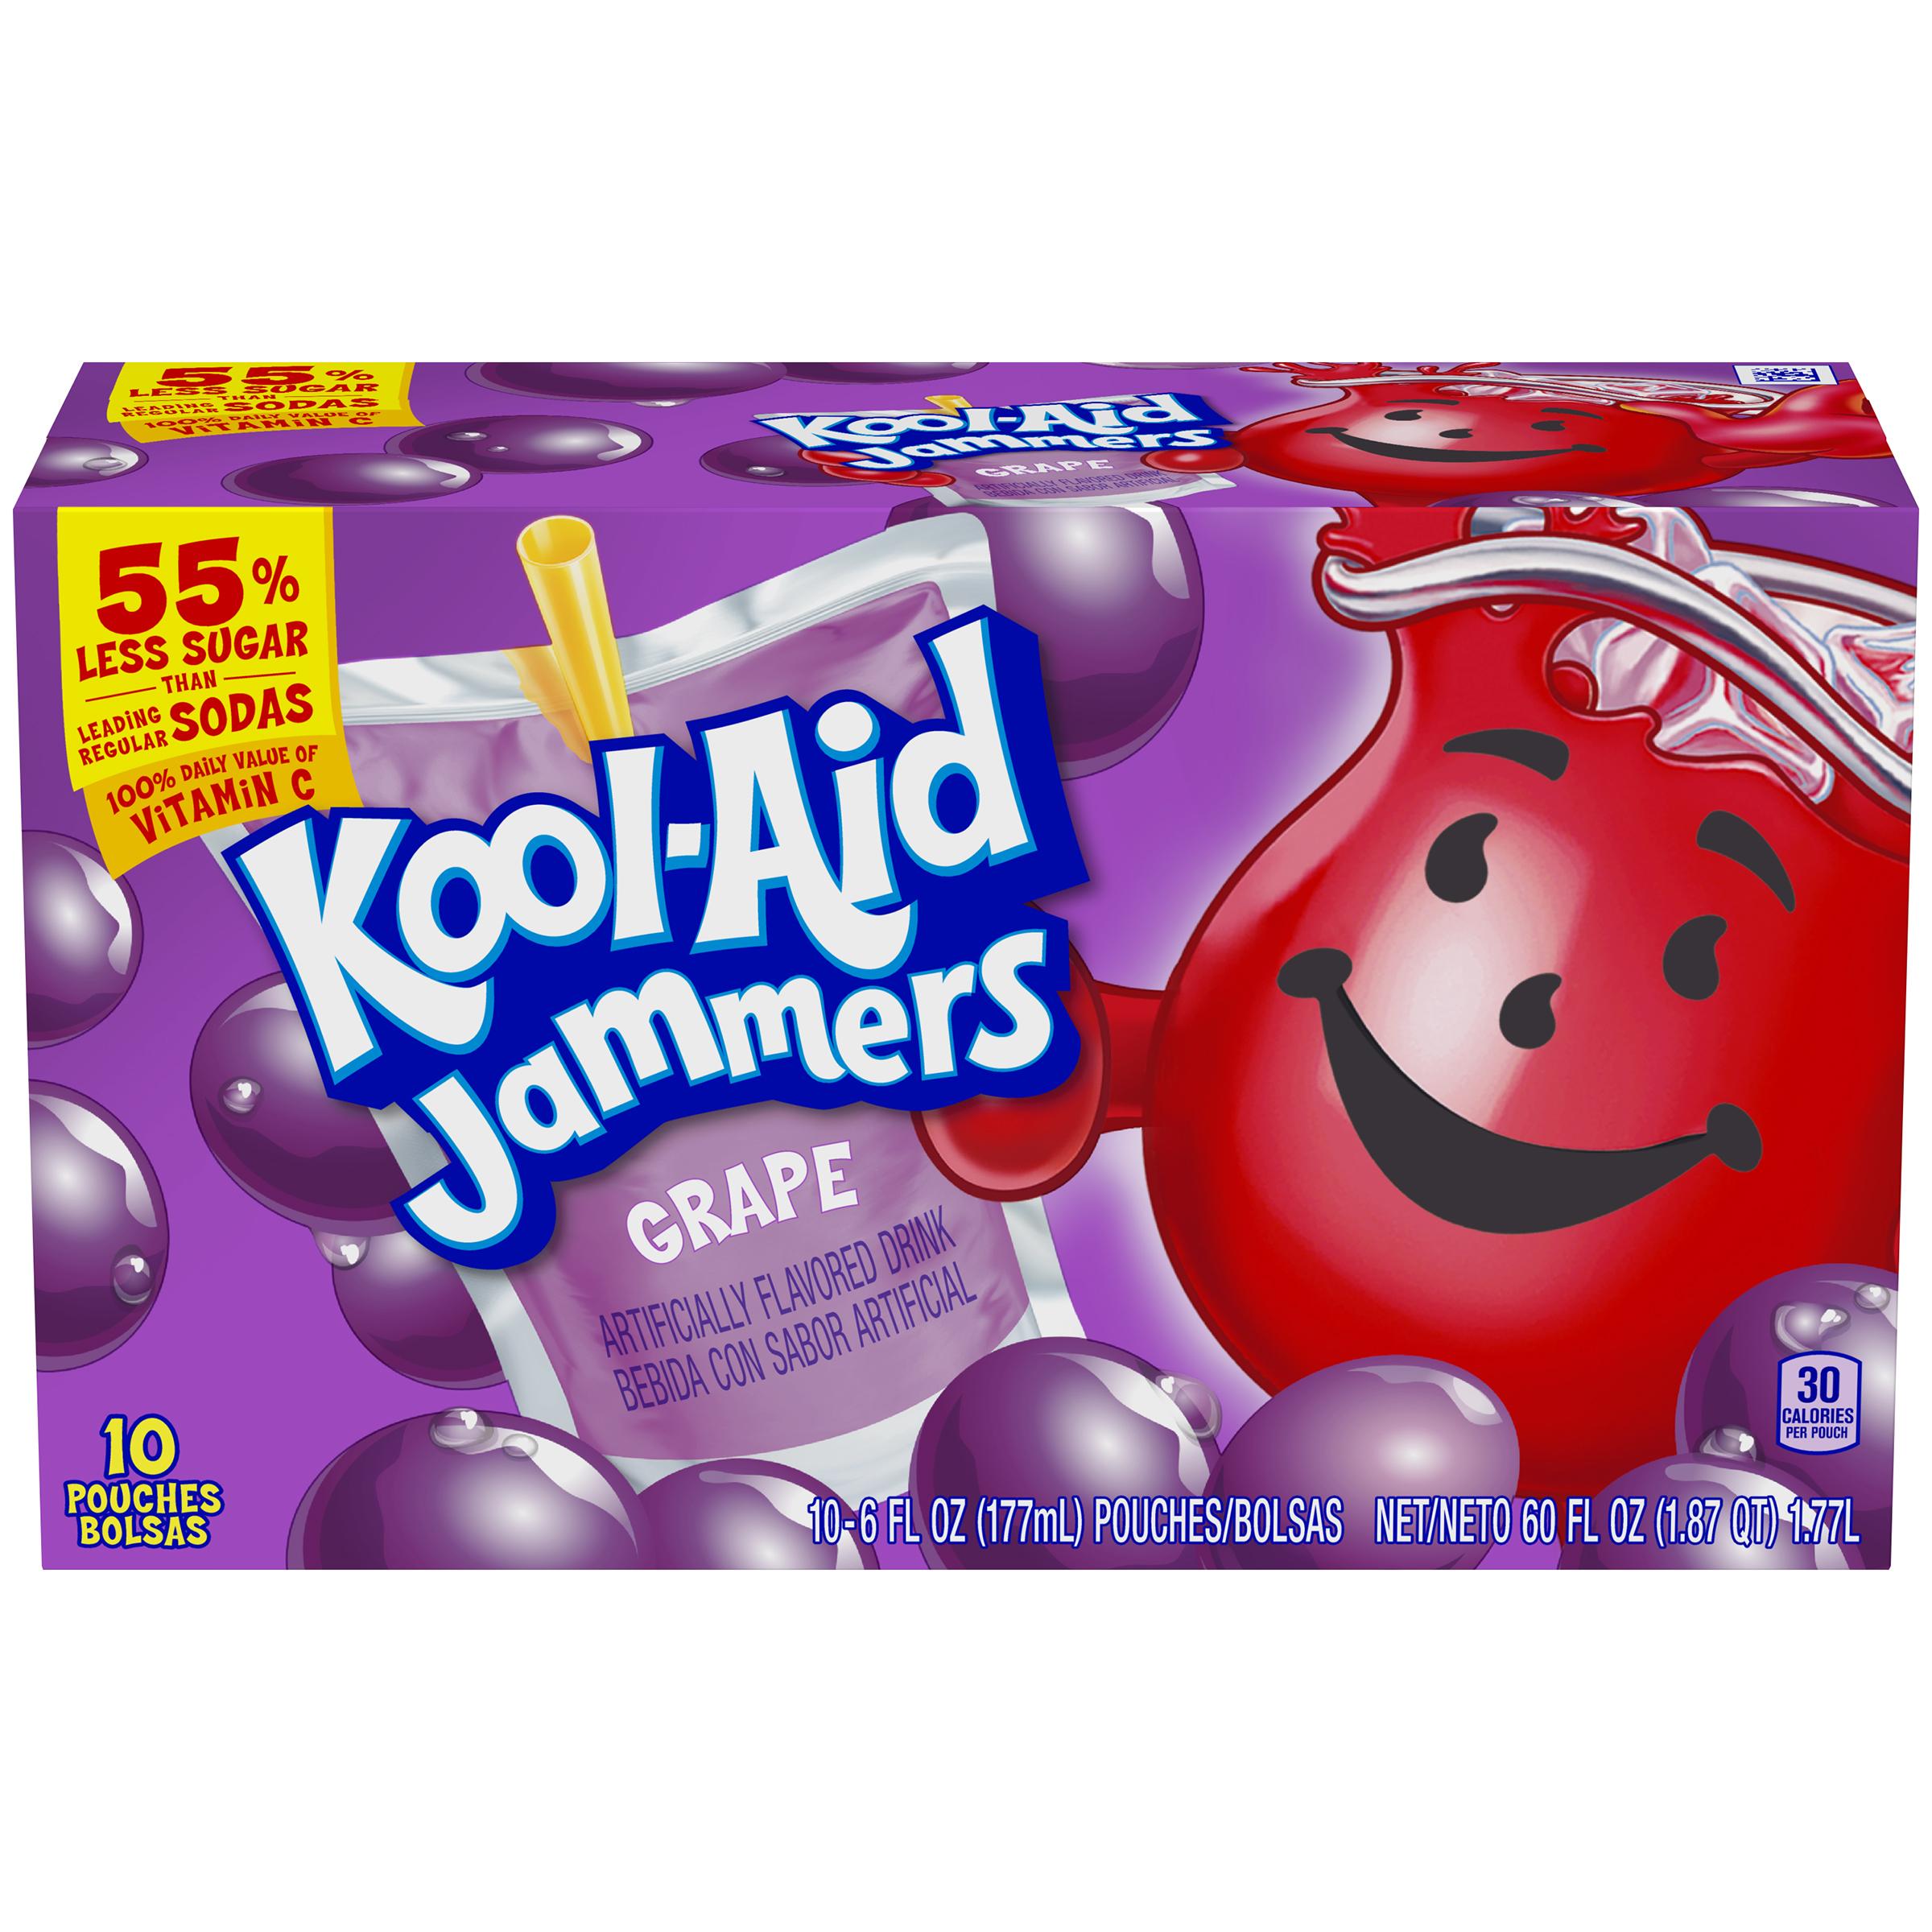 Kool-Aid Jammers Grape Flavored Drink 60 fl oz Box (10-6 fl oz Pouches) image